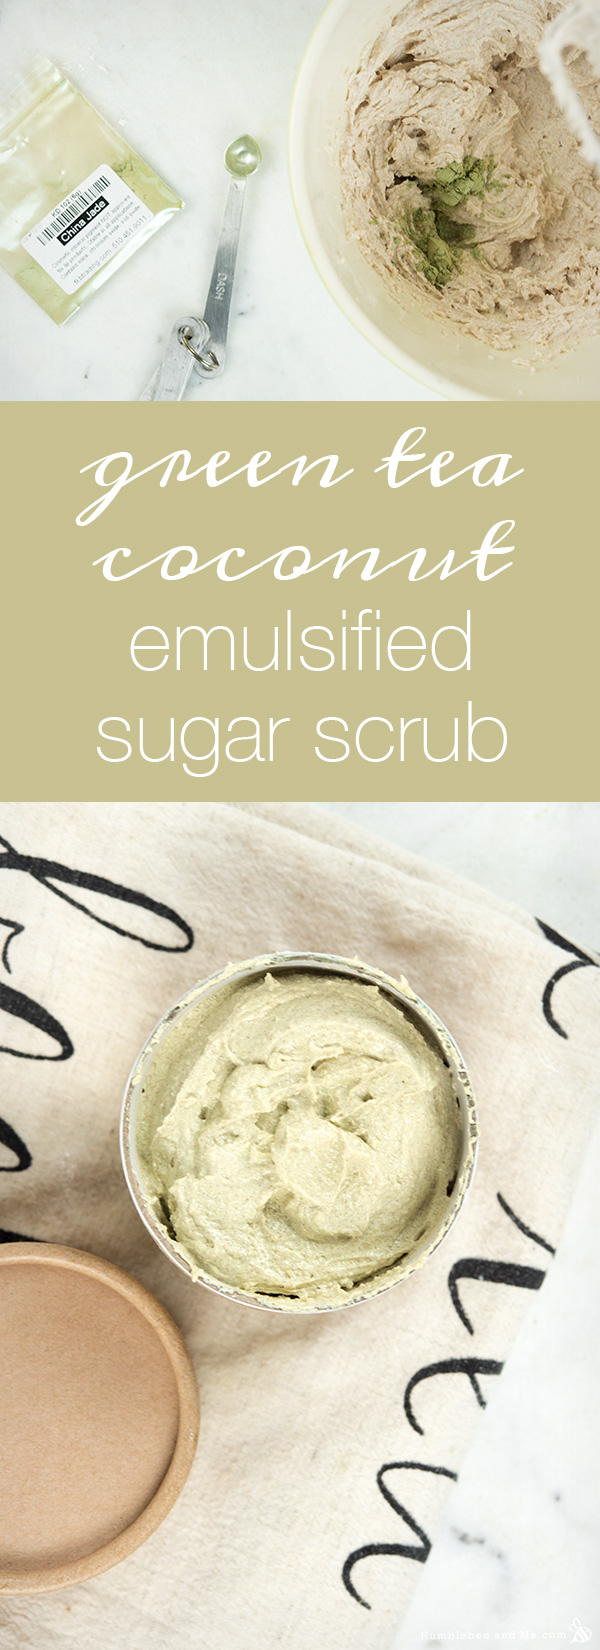 How to Make Green Tea Coconut Emulsified Sugar Scrub